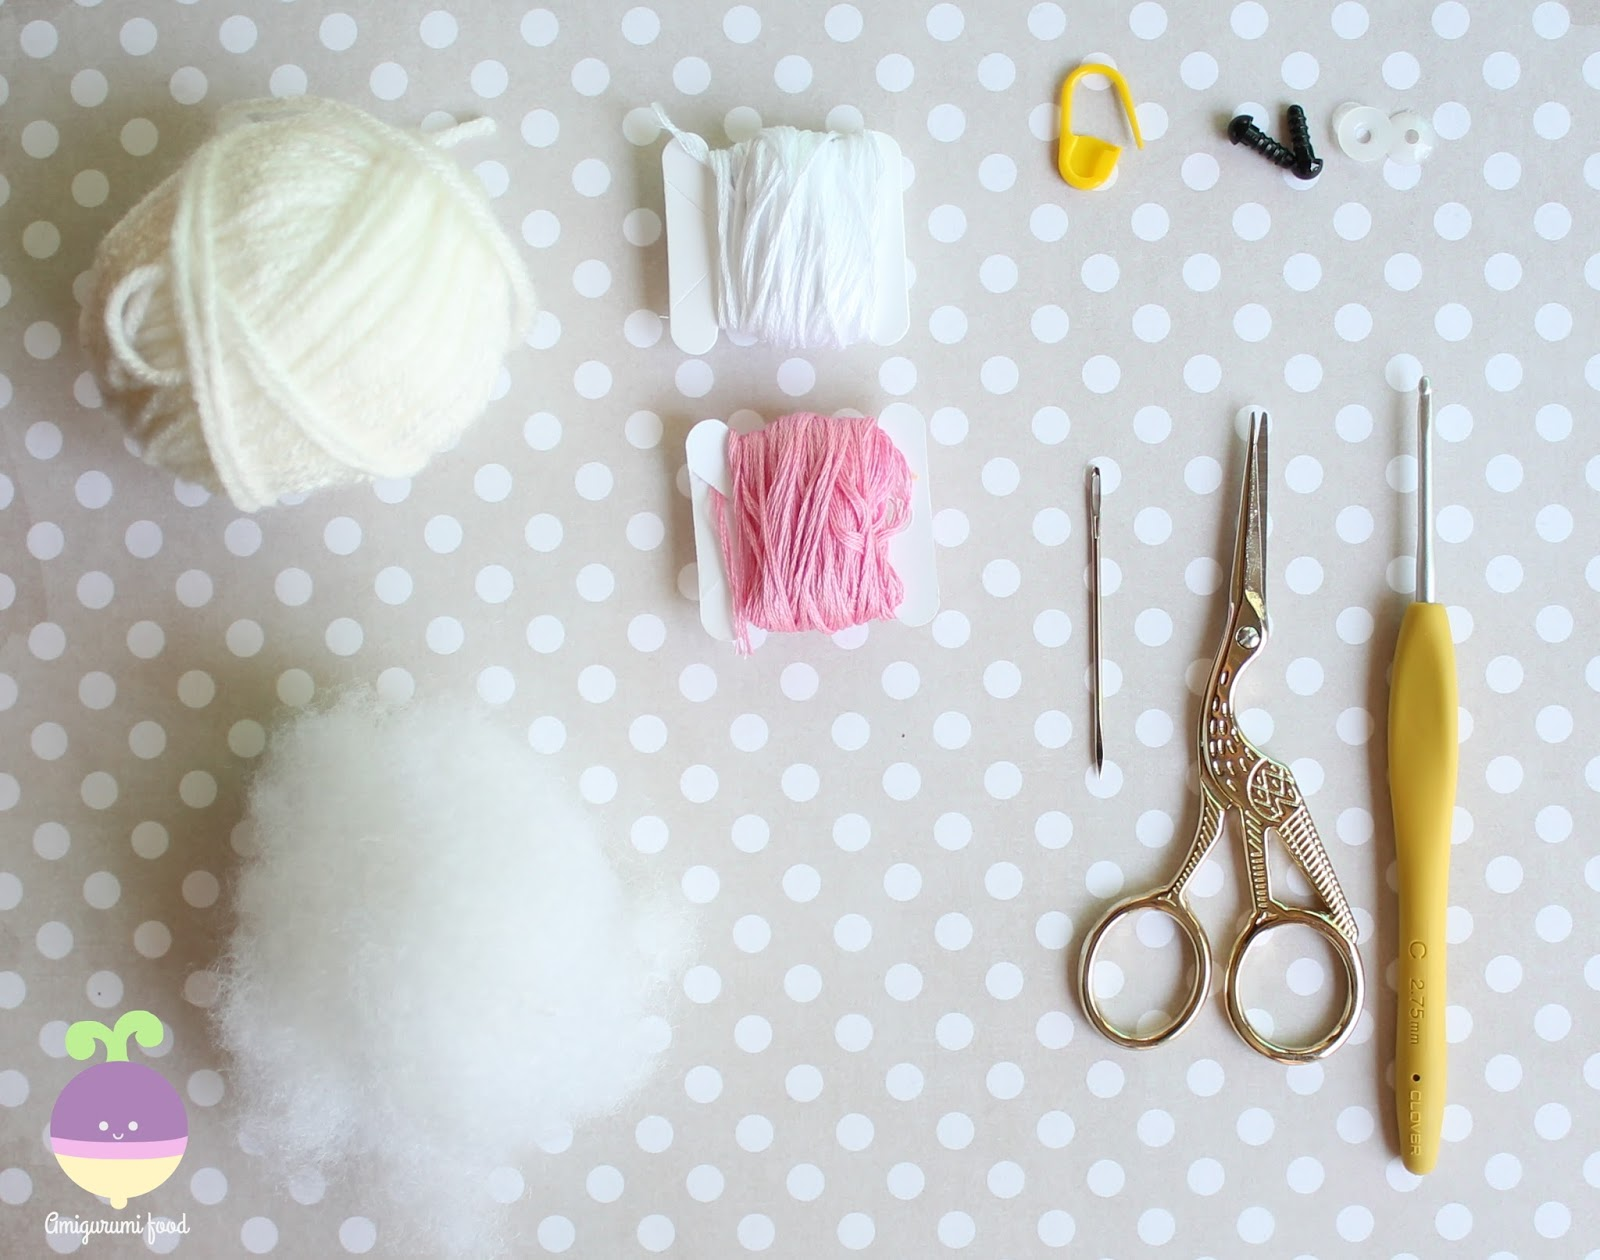 10 Tips & Tricks to Help Make the Best Amigurumi | 1260x1600